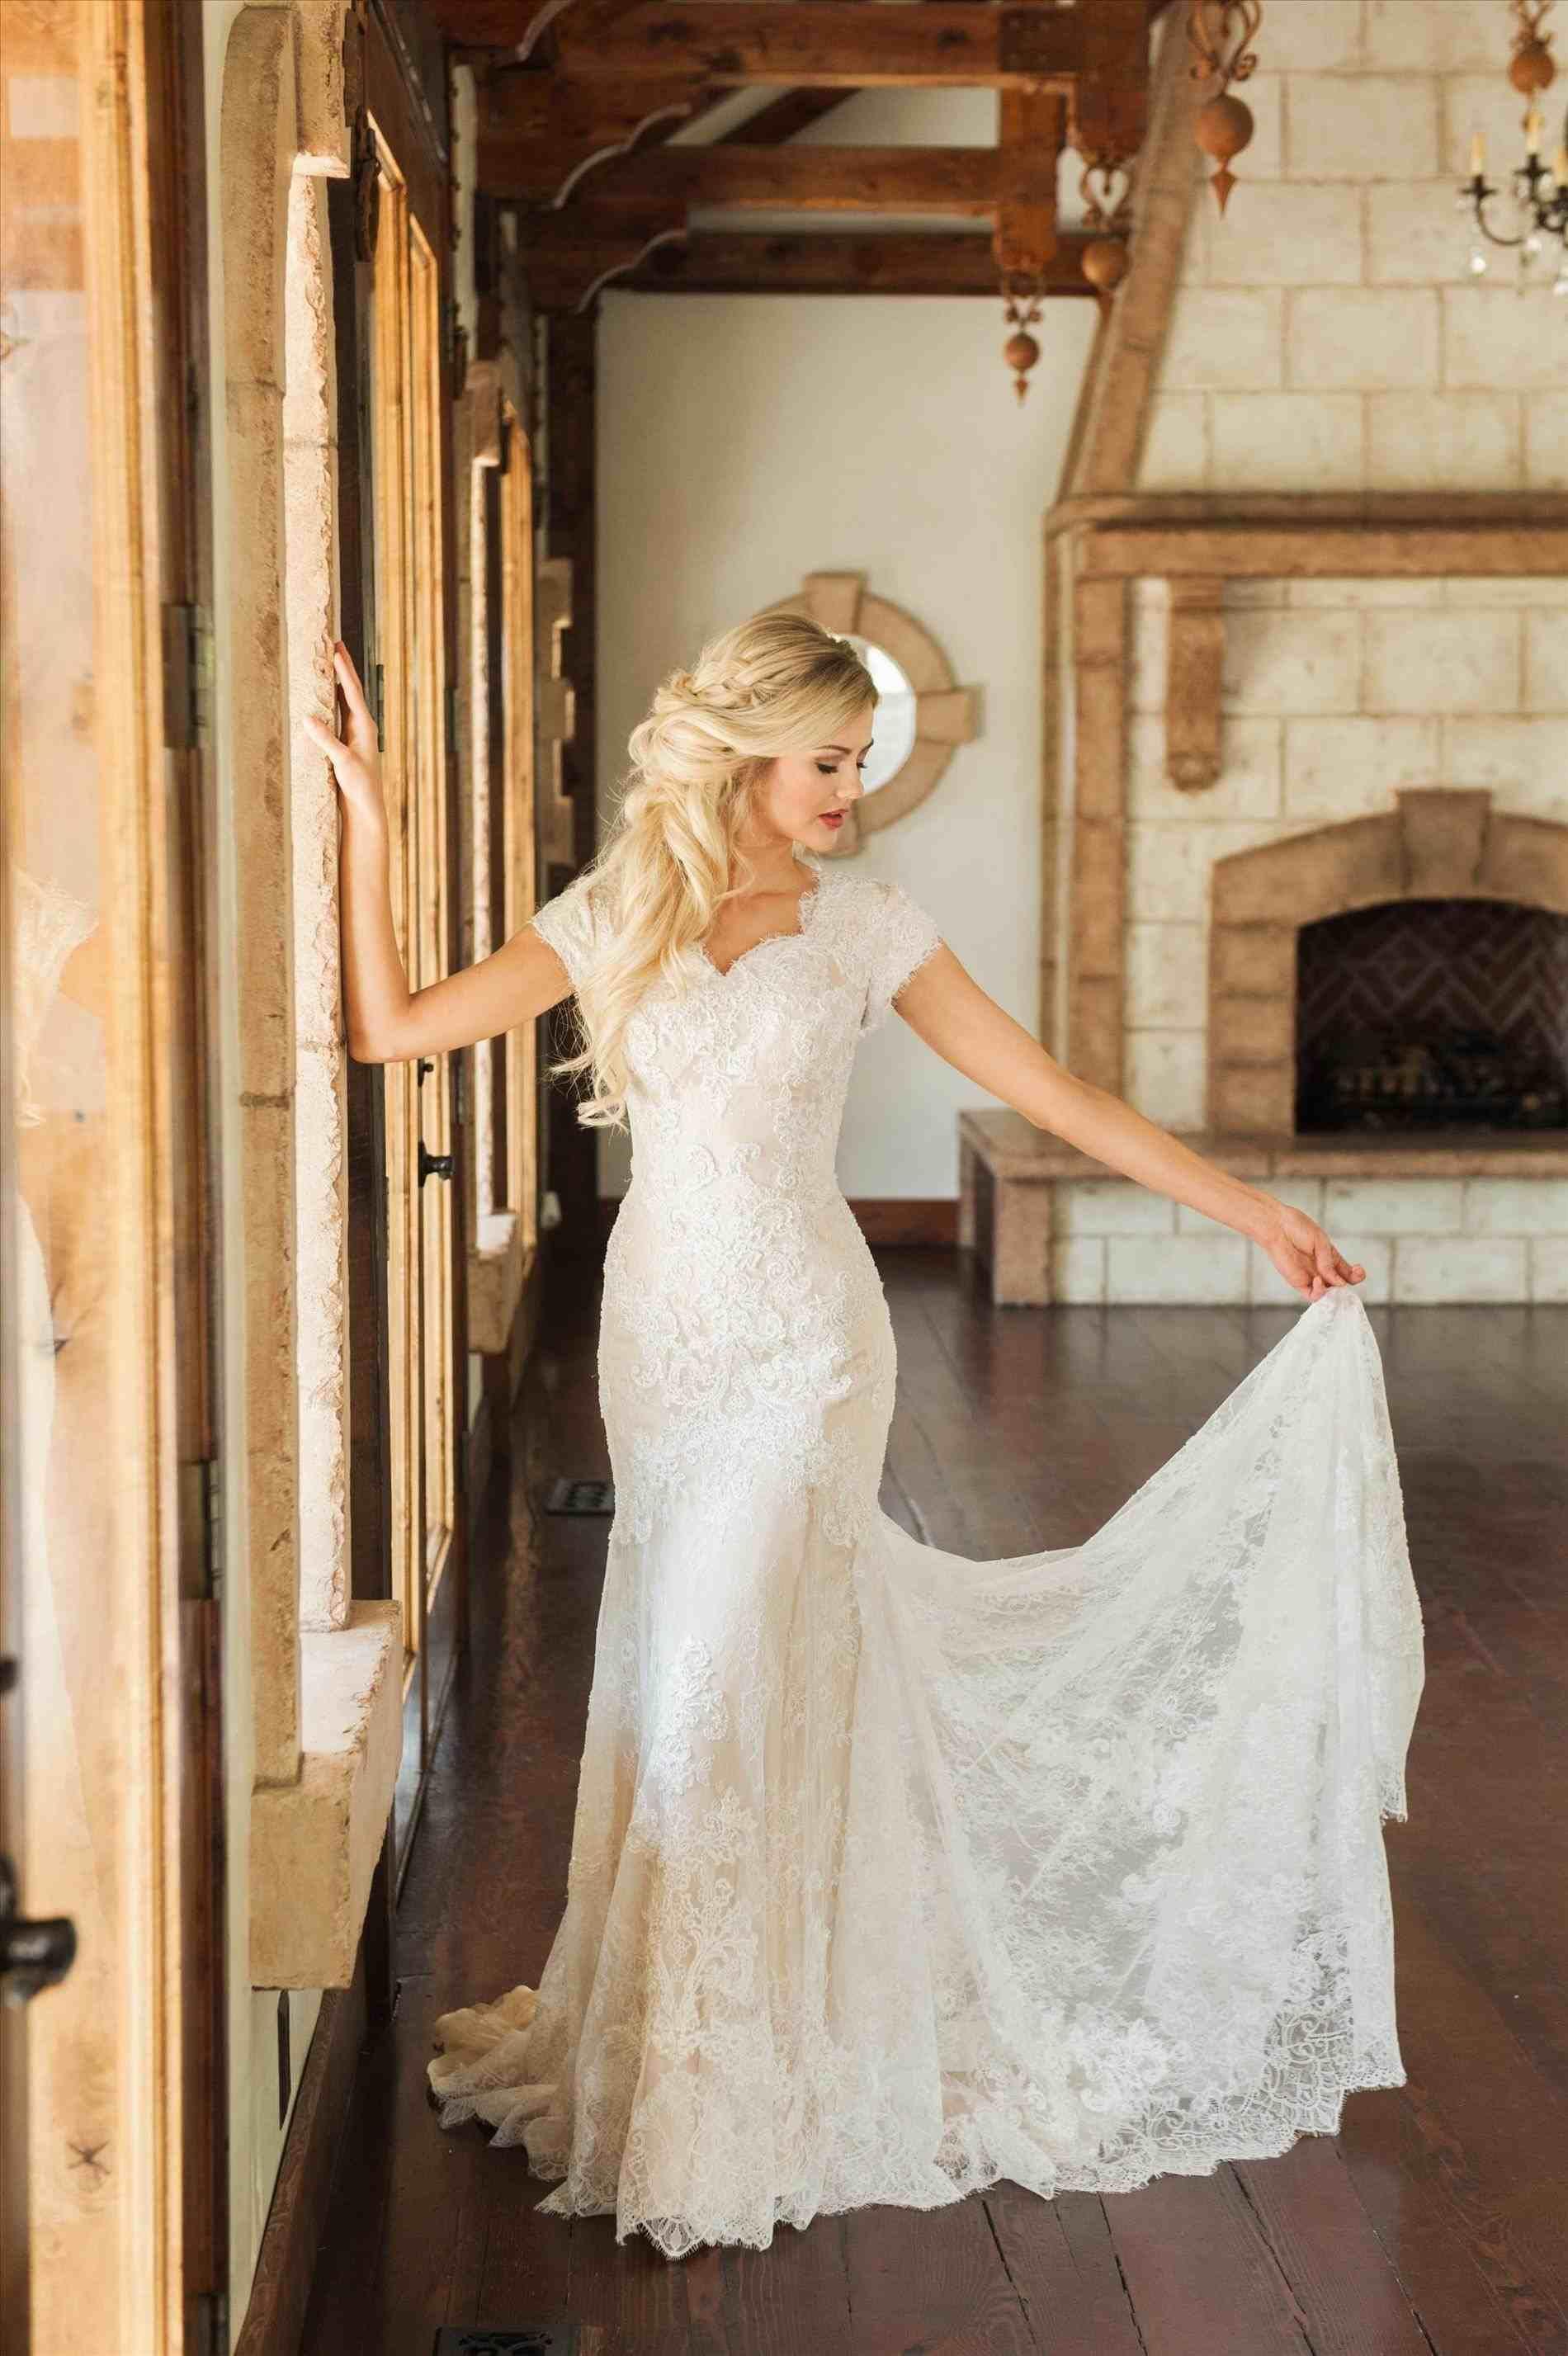 Vintage Conservative Wedding Dresses Amanda Garrigus Red Dress And A Silver Shoe Wedding Dresses Short Bride Modest Wedding Dresses Short Sleeve Wedding Dress [ 2855 x 1900 Pixel ]